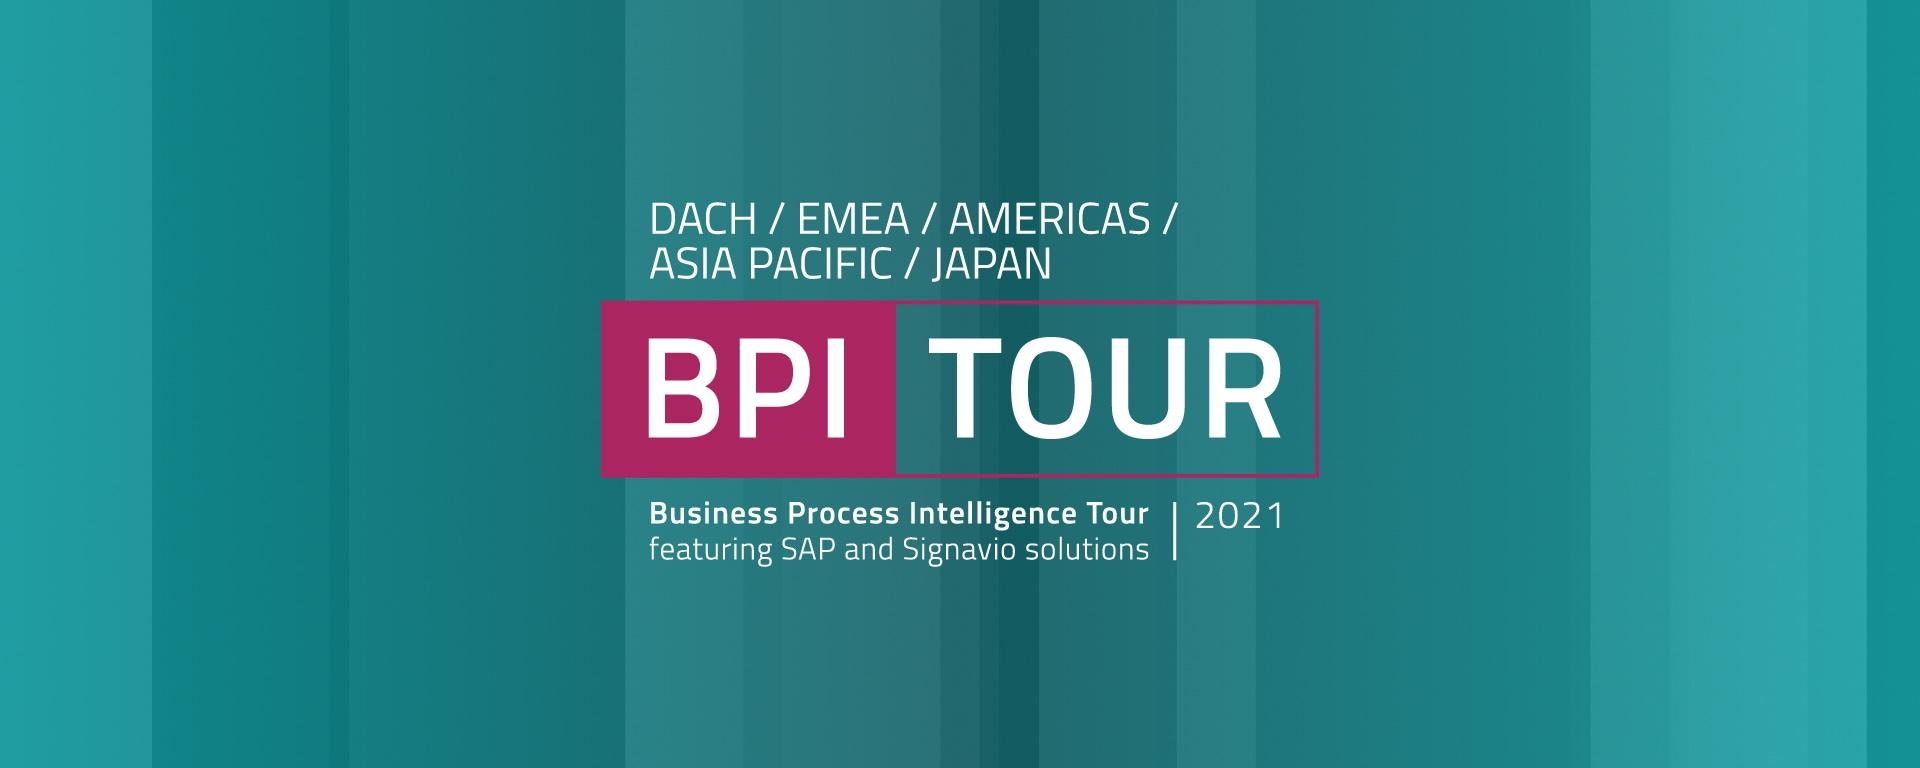 Recap BPI tour 2021 blog post header image